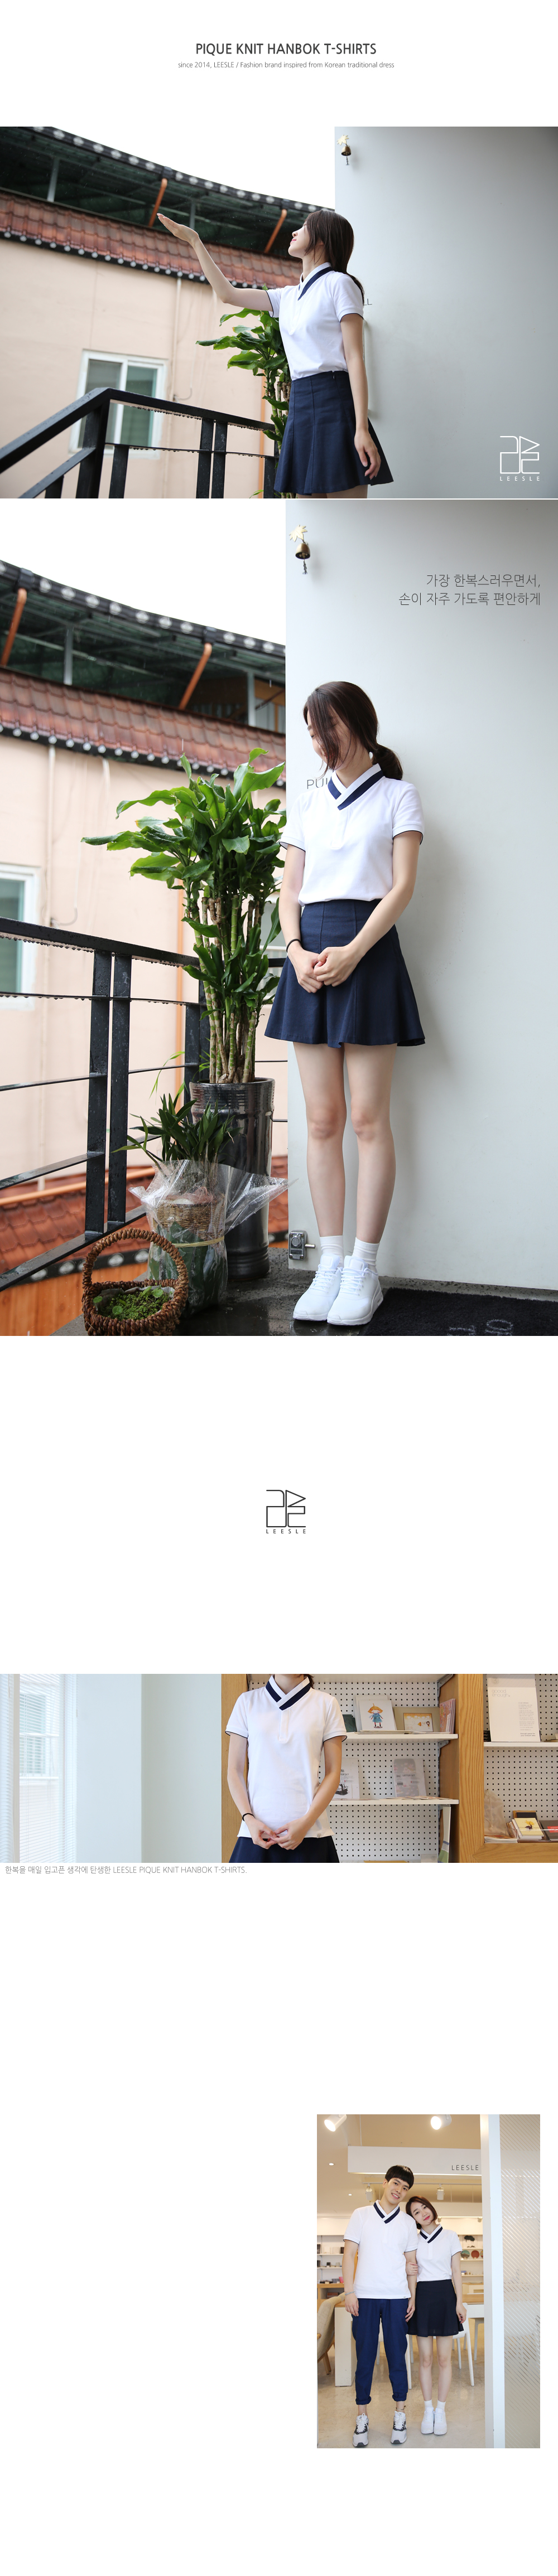 [ leesle ] PK 女式韩服的 T 恤衫-[白色]